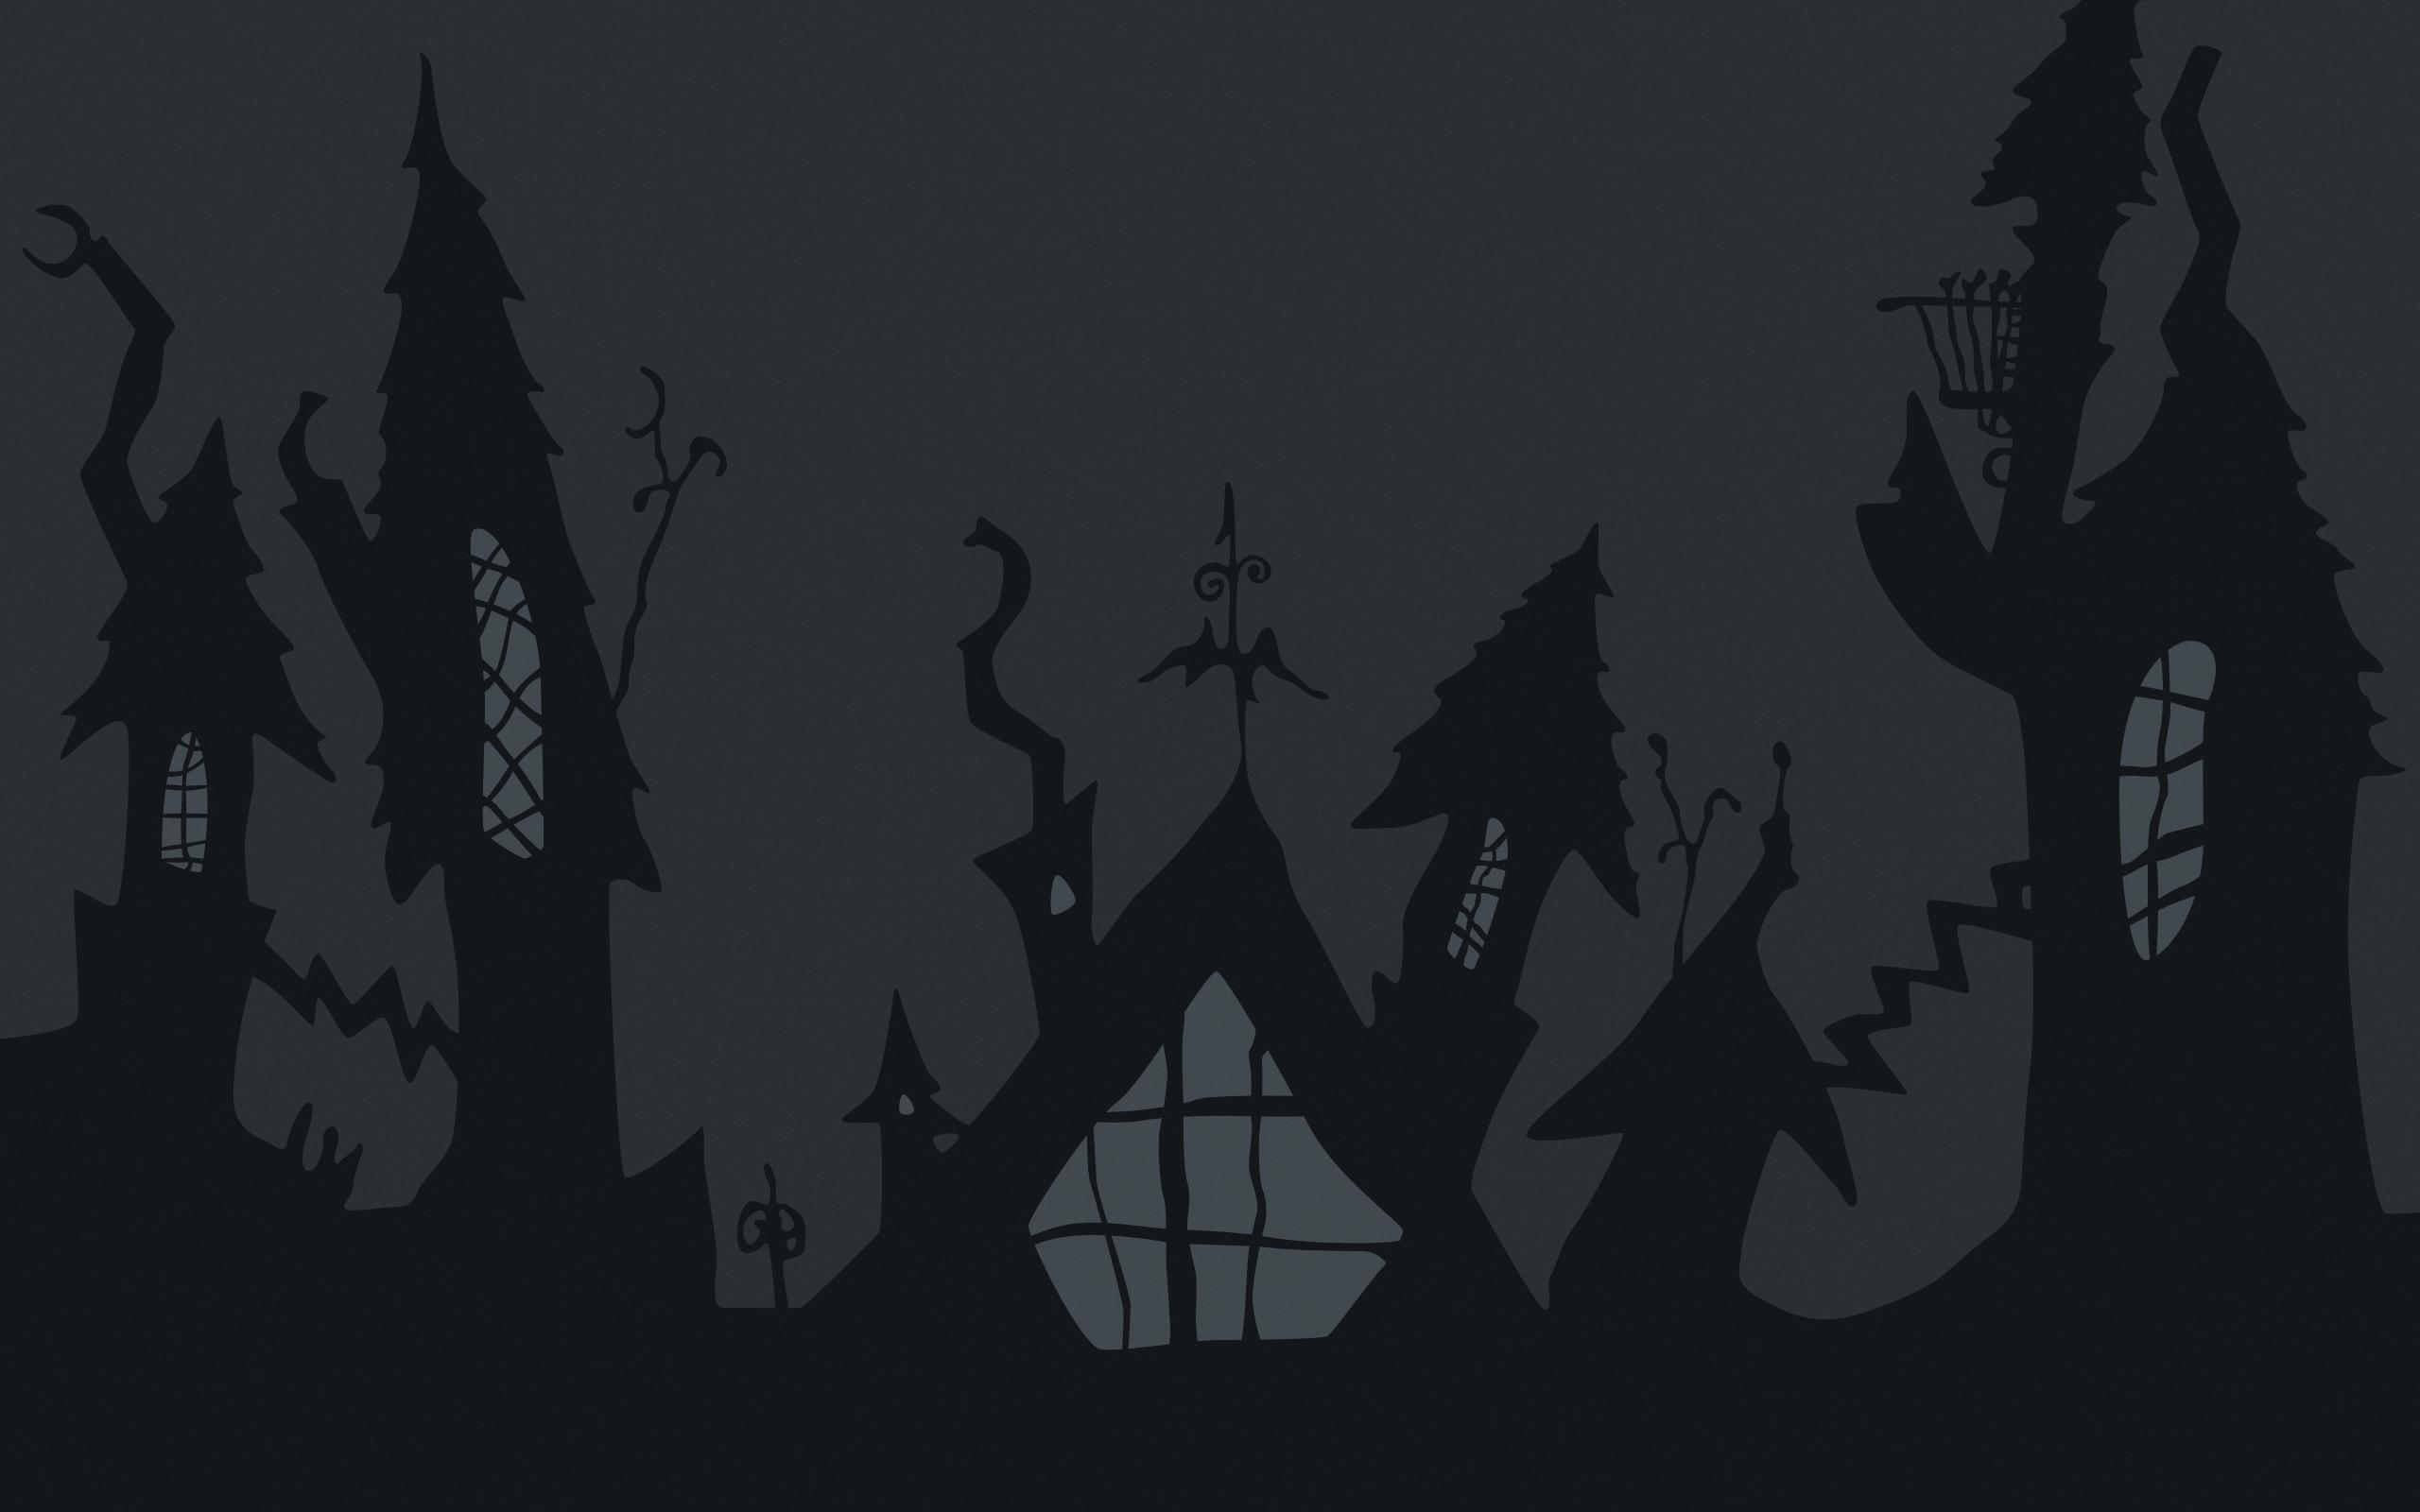 halloweentown nightmare before christmas wallpaper » Wallppapers …  Halloweentown Nightmare Before Christmas Wallpaper Wallppapers